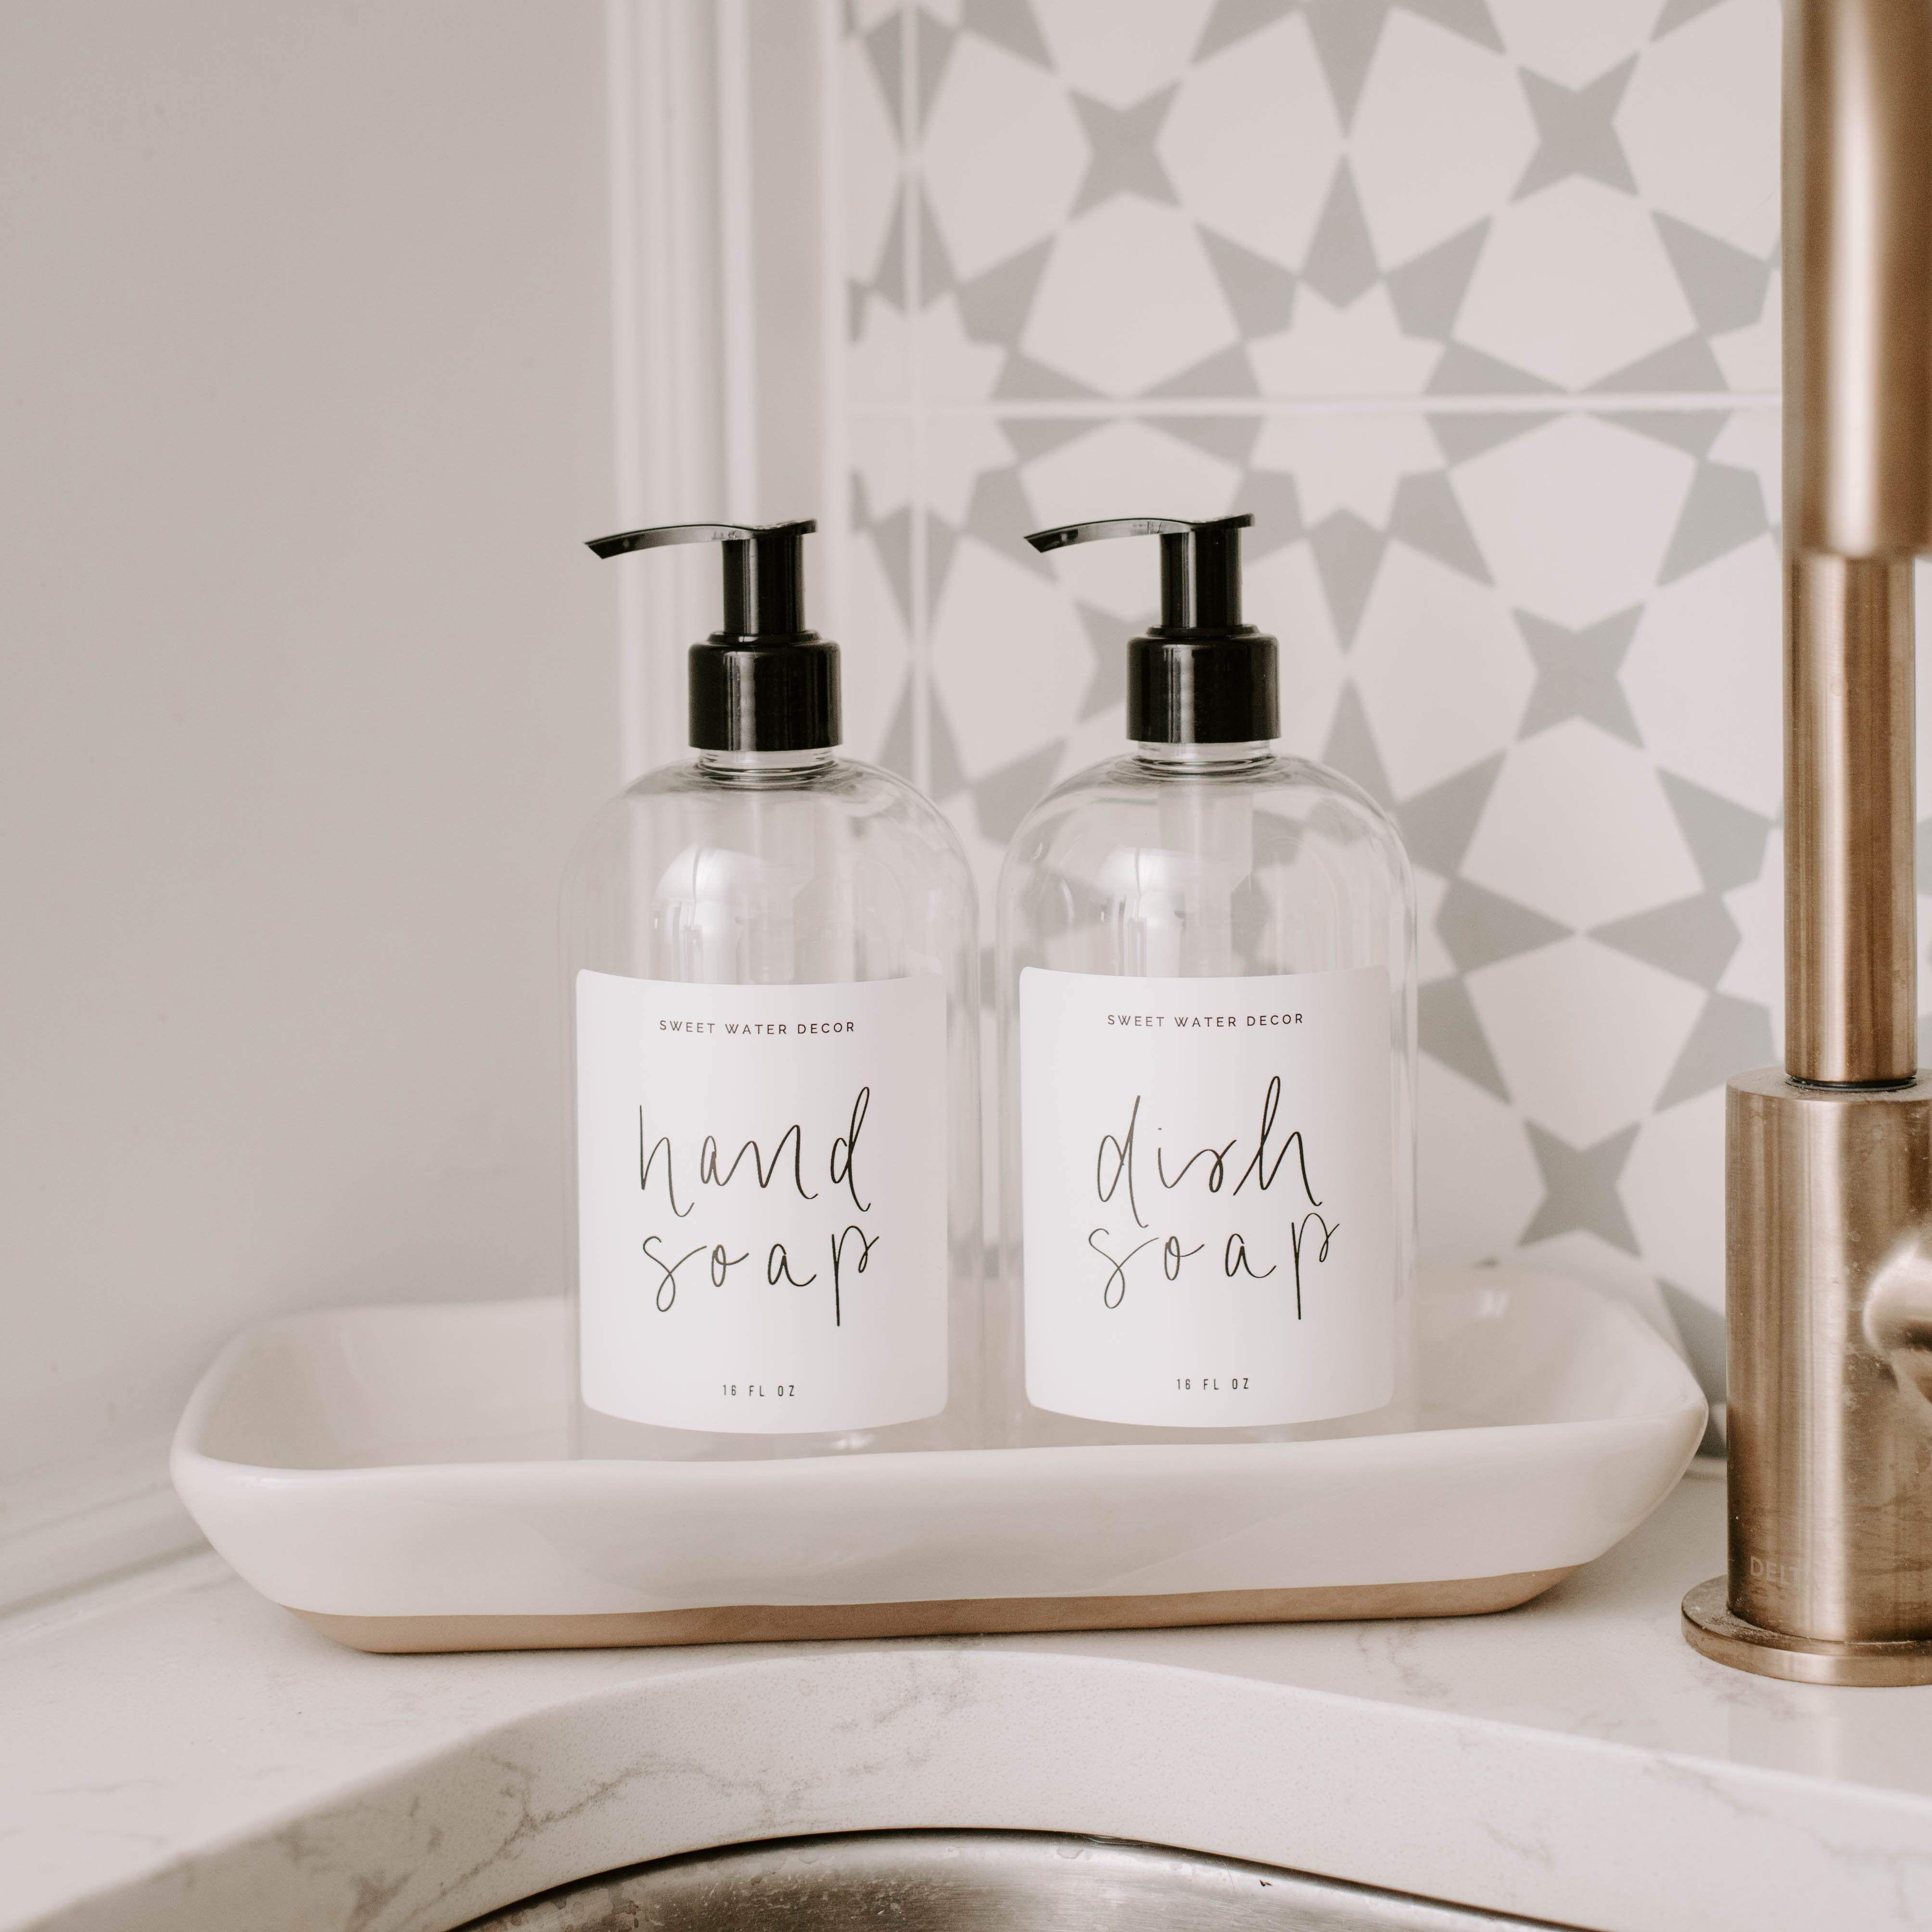 16oz Clear Plastic Countertop Dispenser Set White Label In 2021 Dish Soap Dispenser Hand Soap Dispenser Soap Dispenser